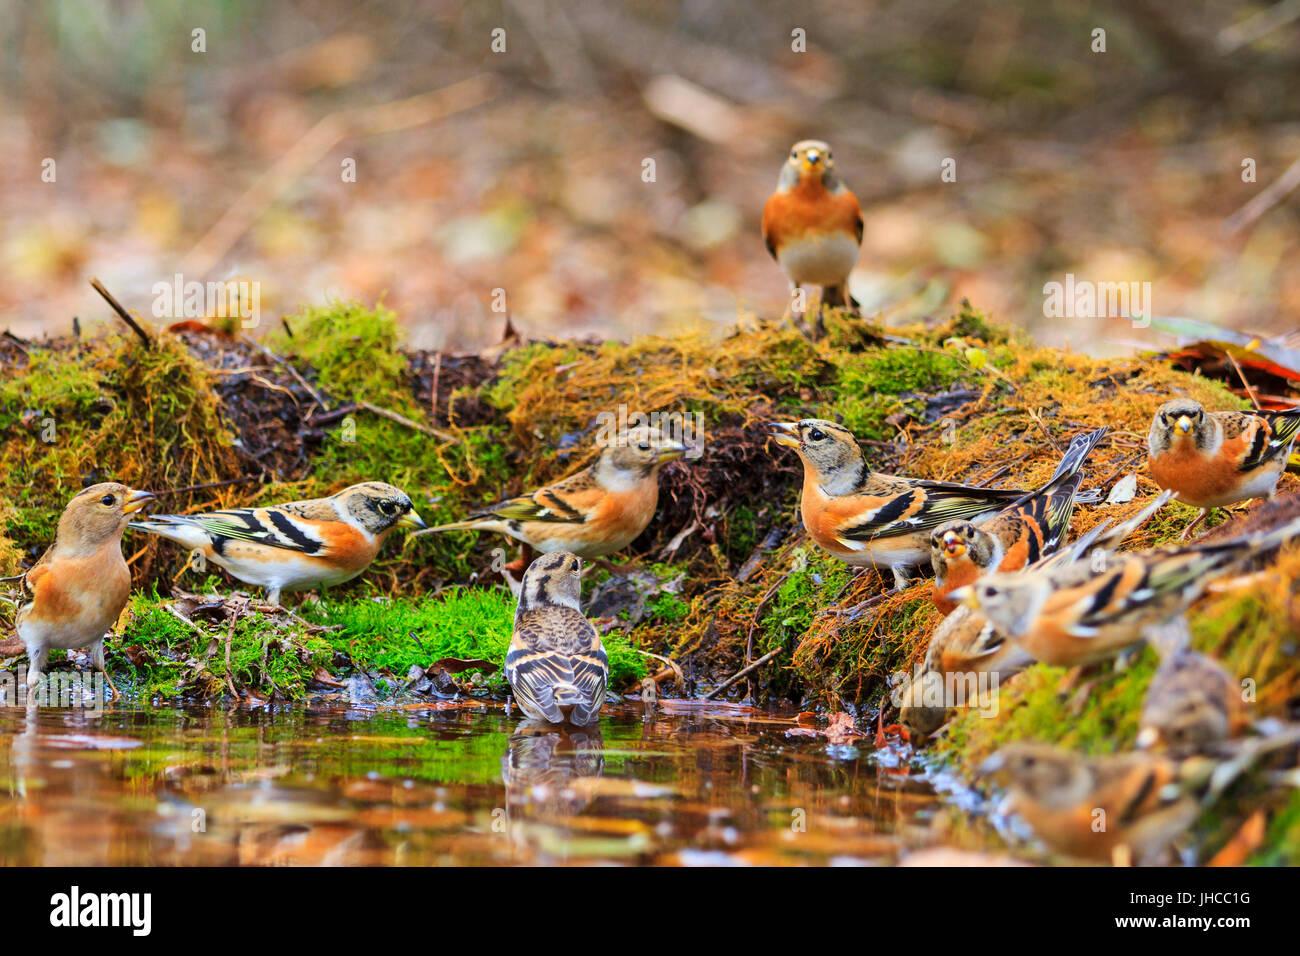 Wild birds among autumn fallen leaves - Stock Image